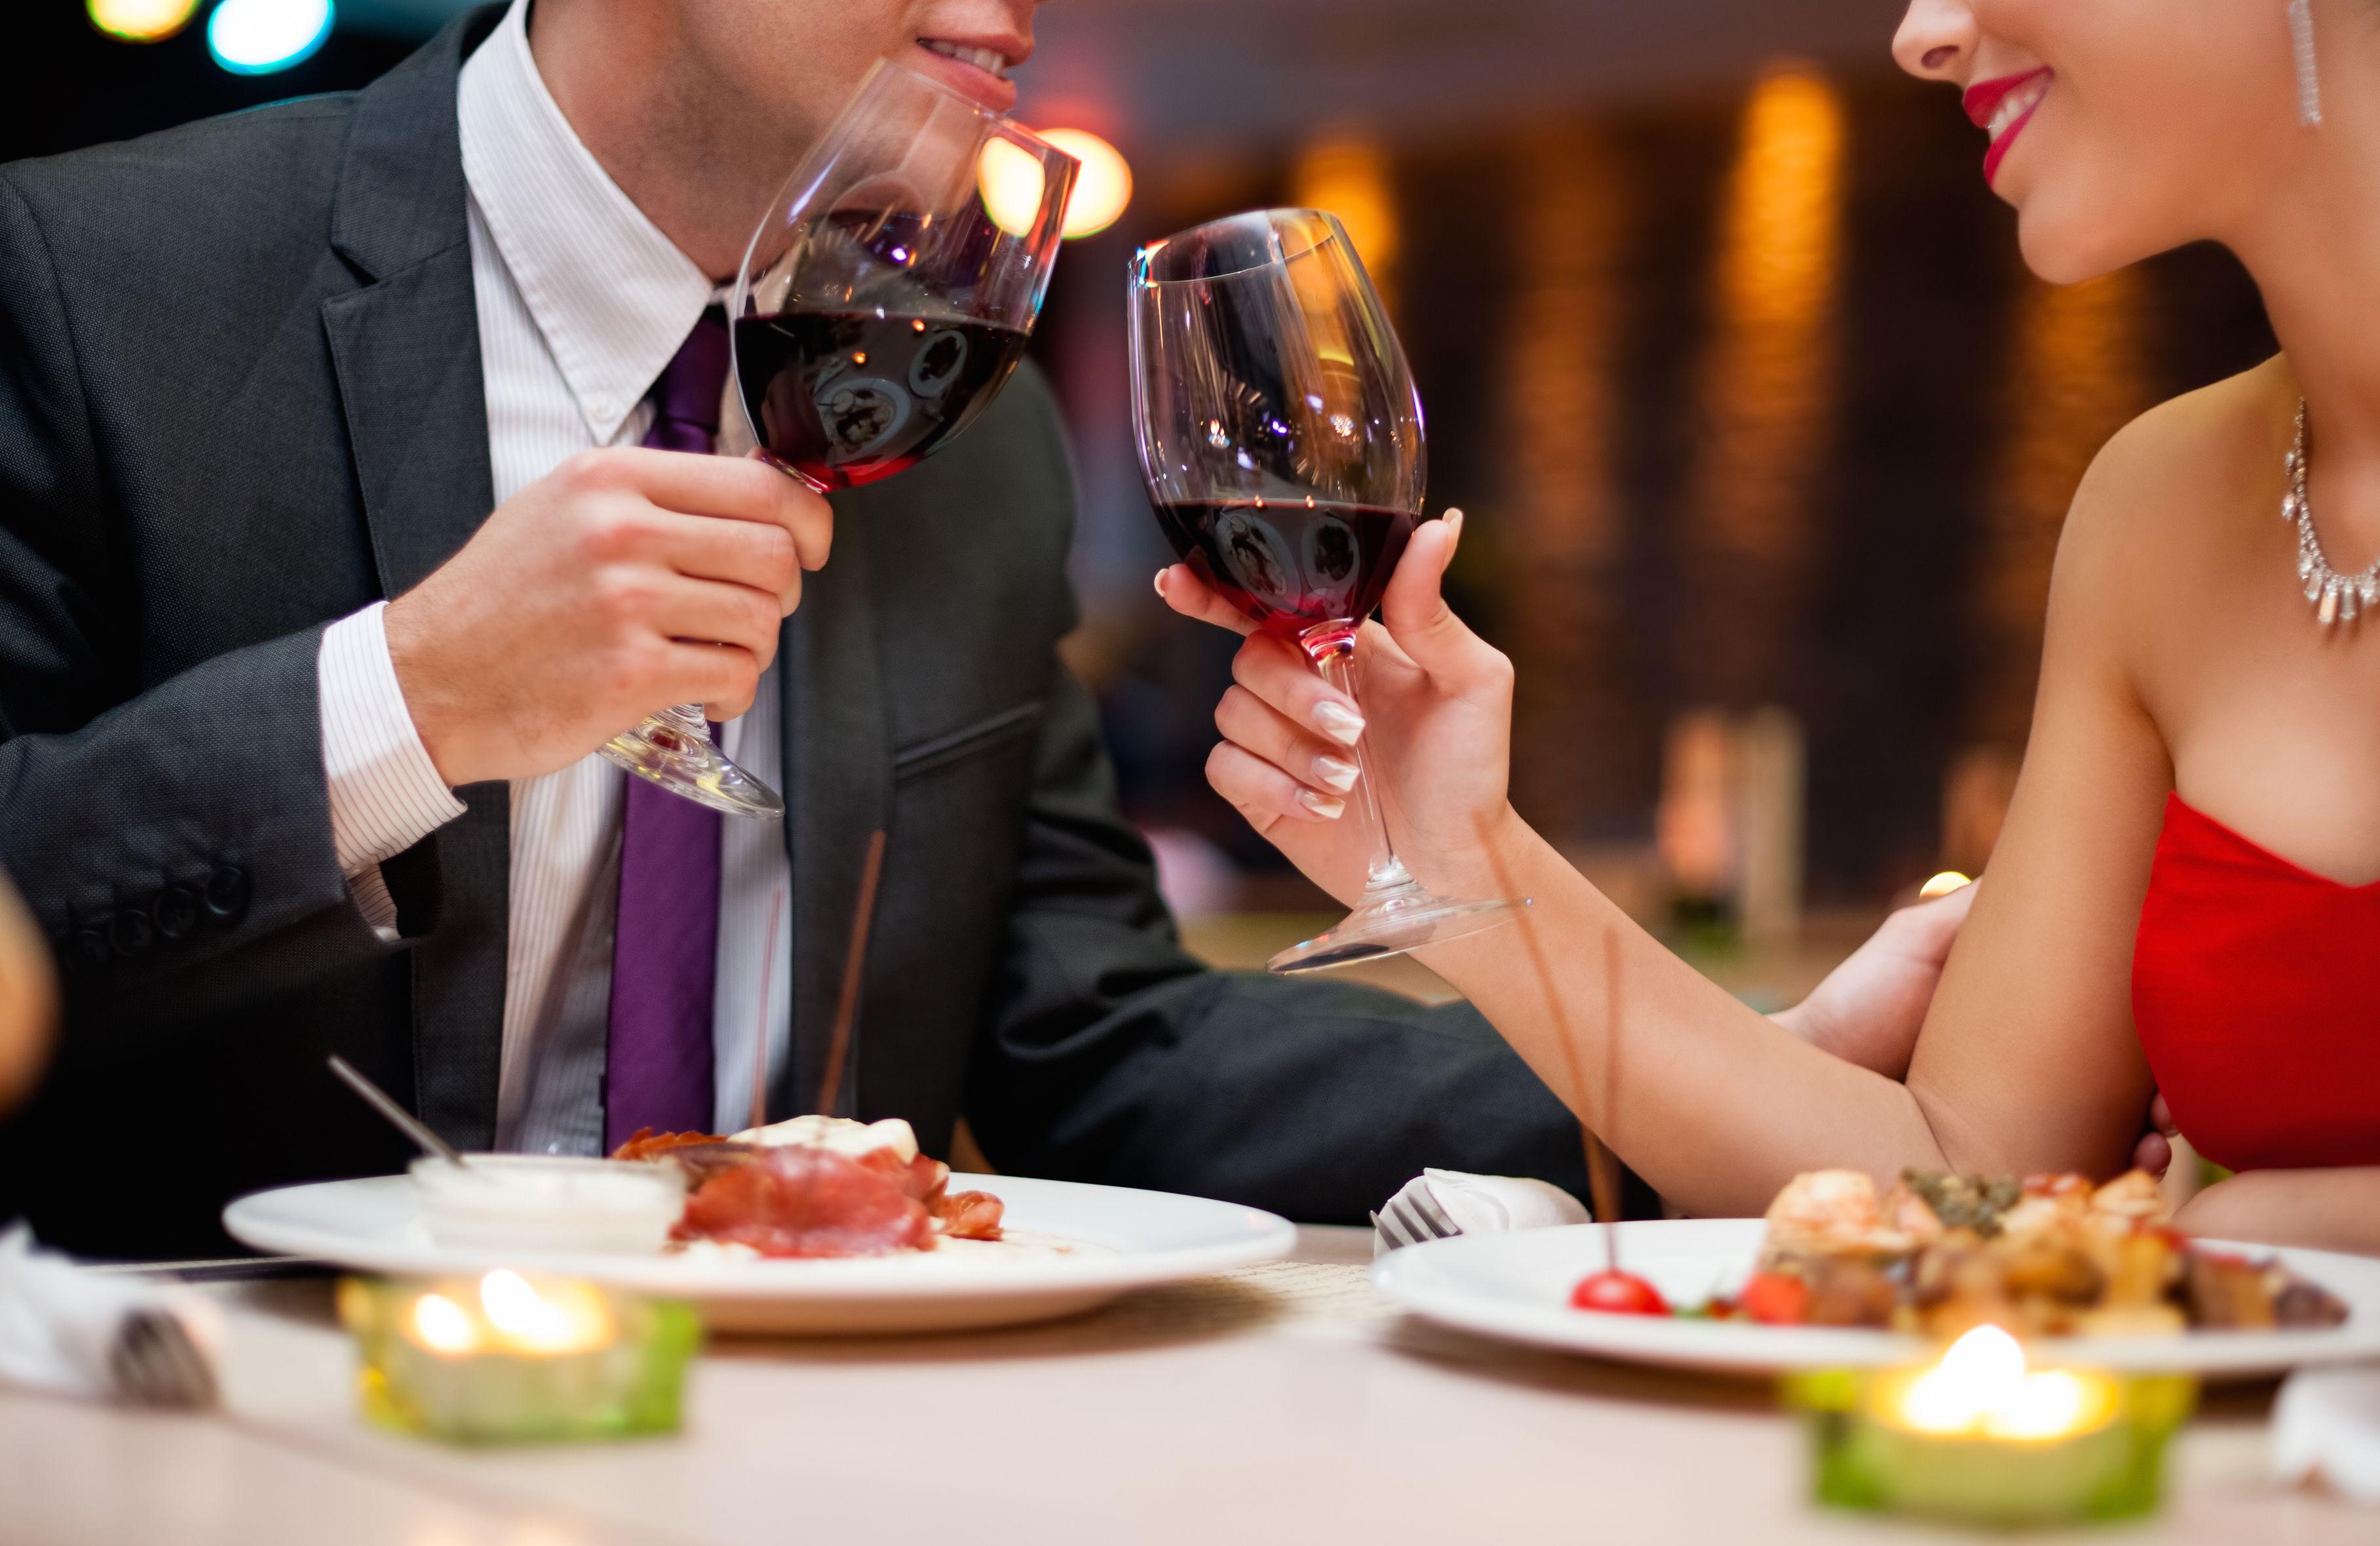 Profil para pemain dating byrå